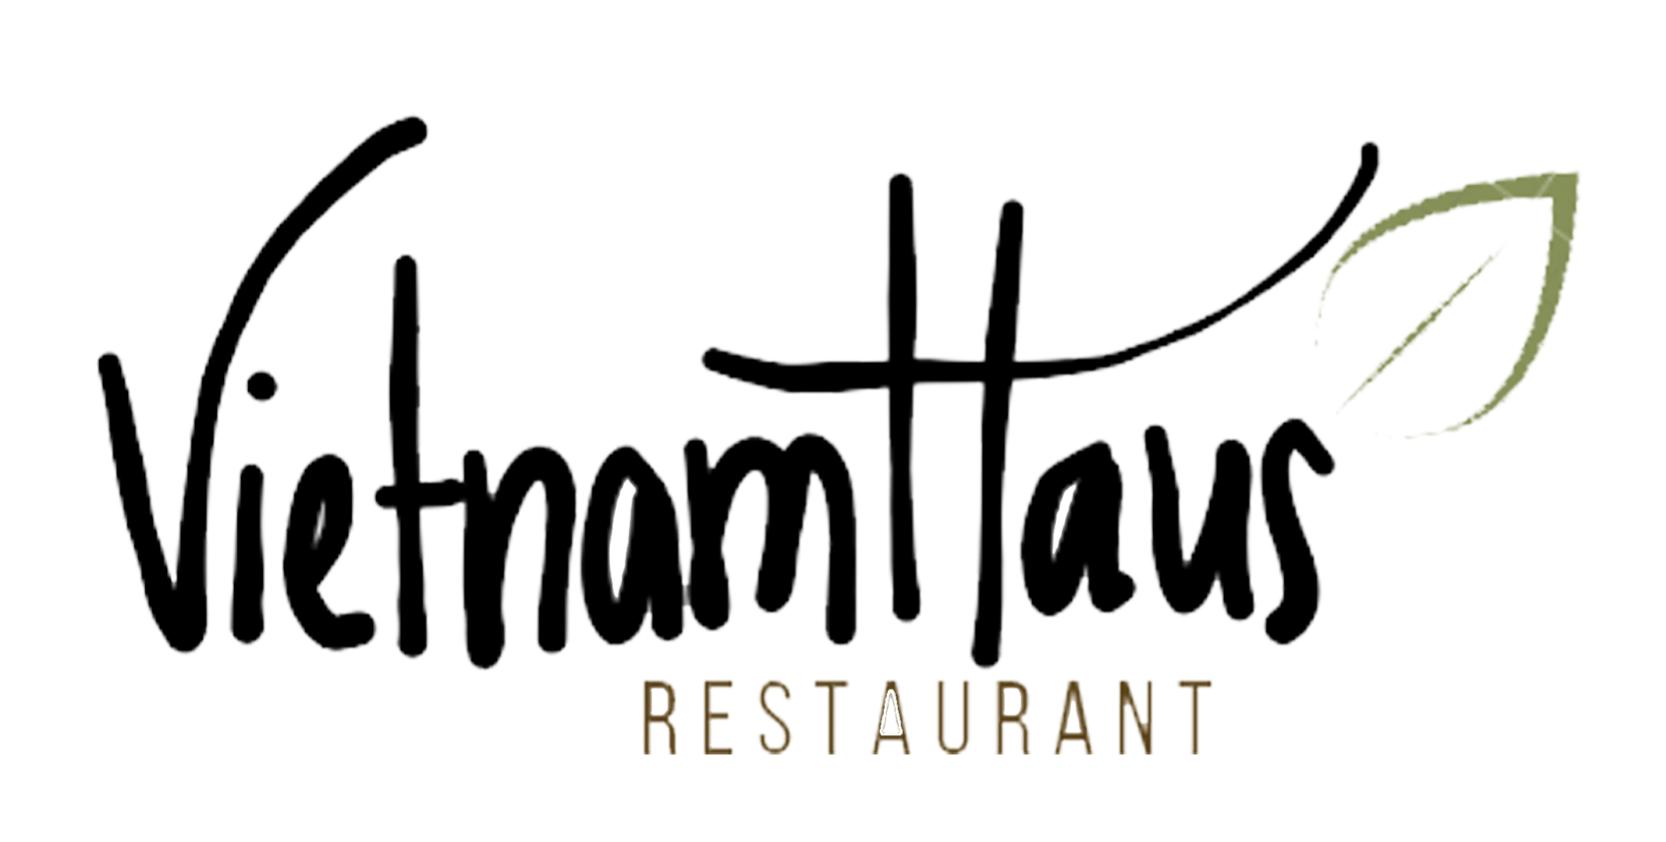 Vietnam Haus Restaurant Logo